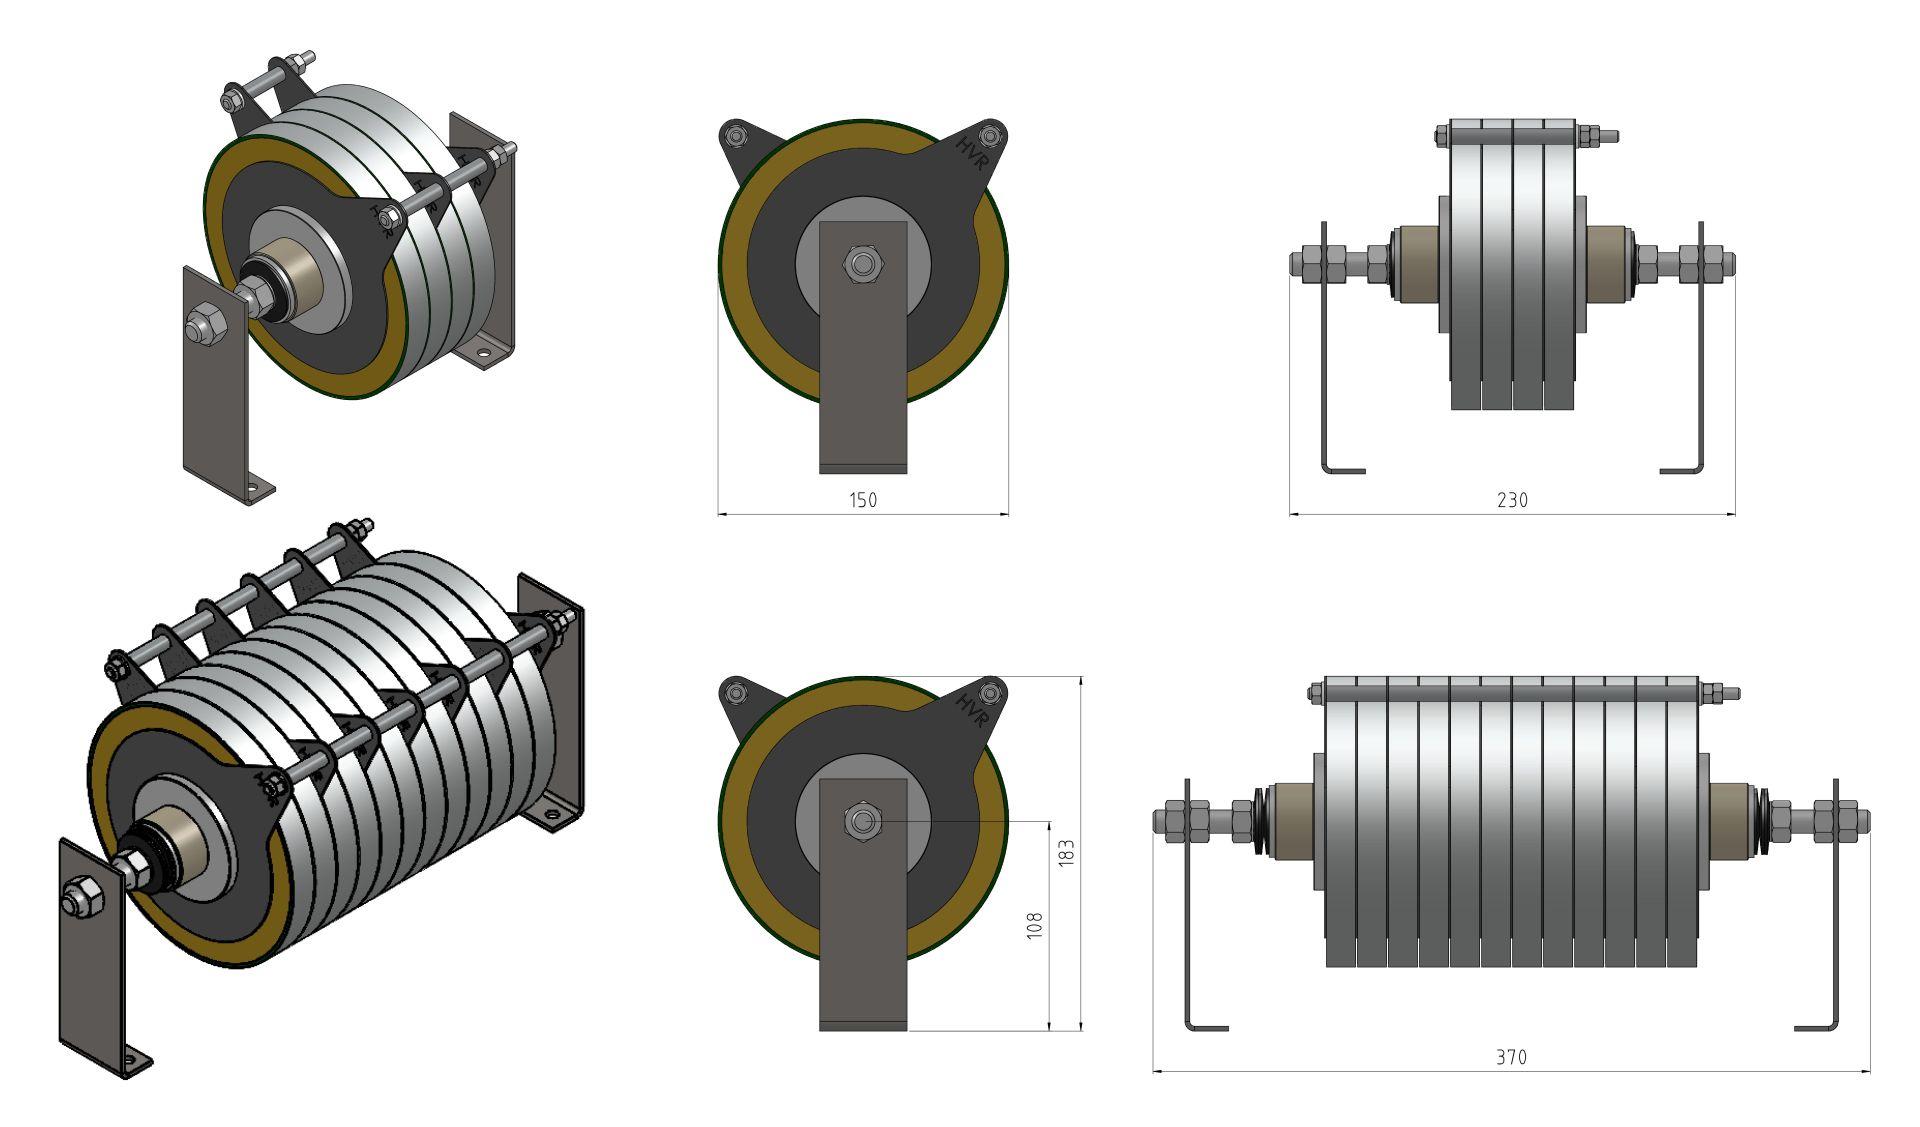 Sample Drawings of Stacks for Generator De-Excitation